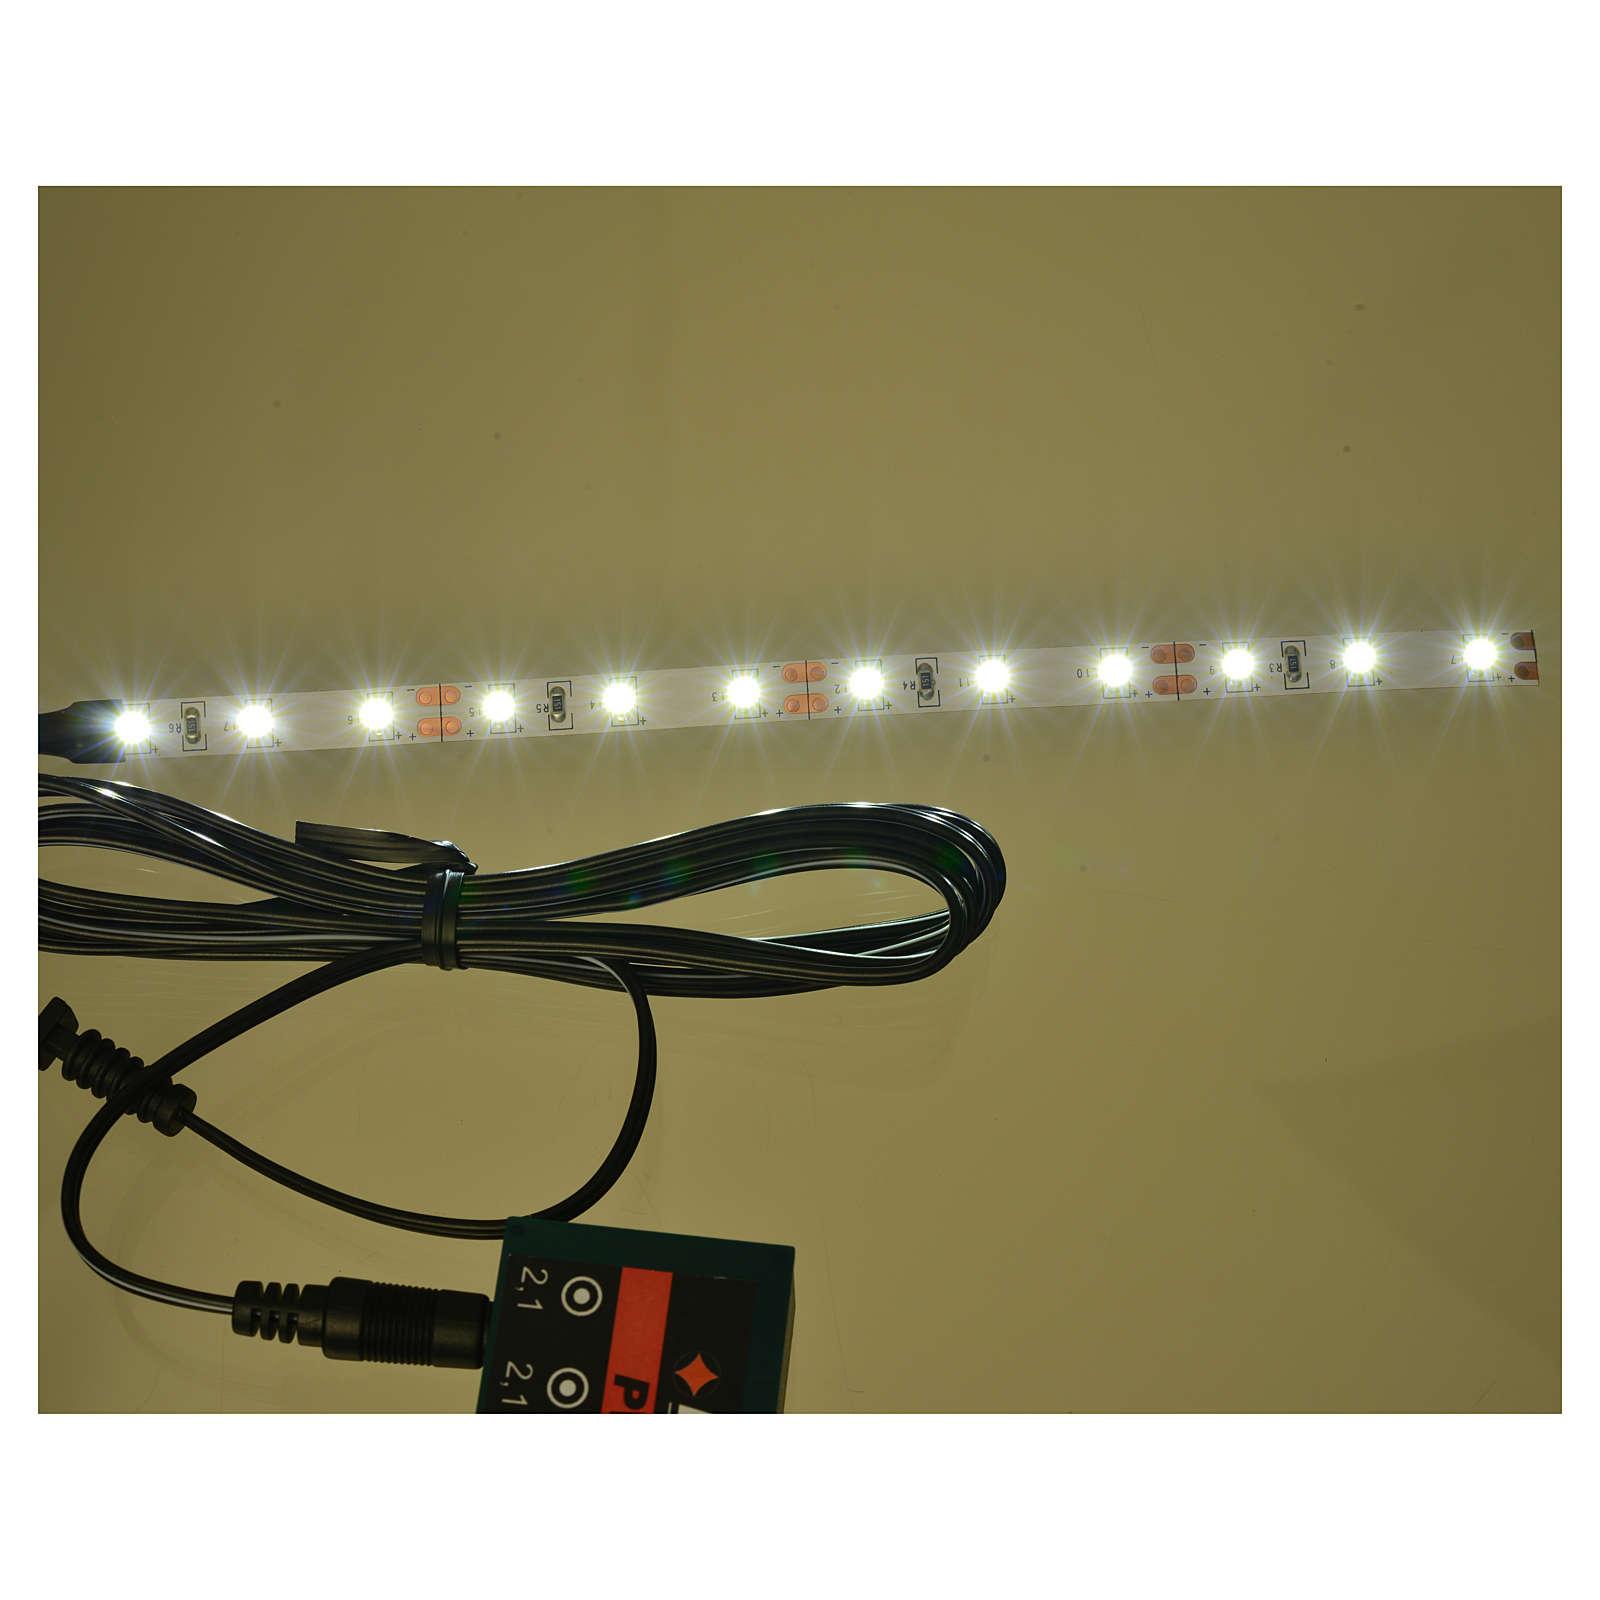 Bande 12 micro-leds pour Frisalight blanc froid 0,8x16 cm 4